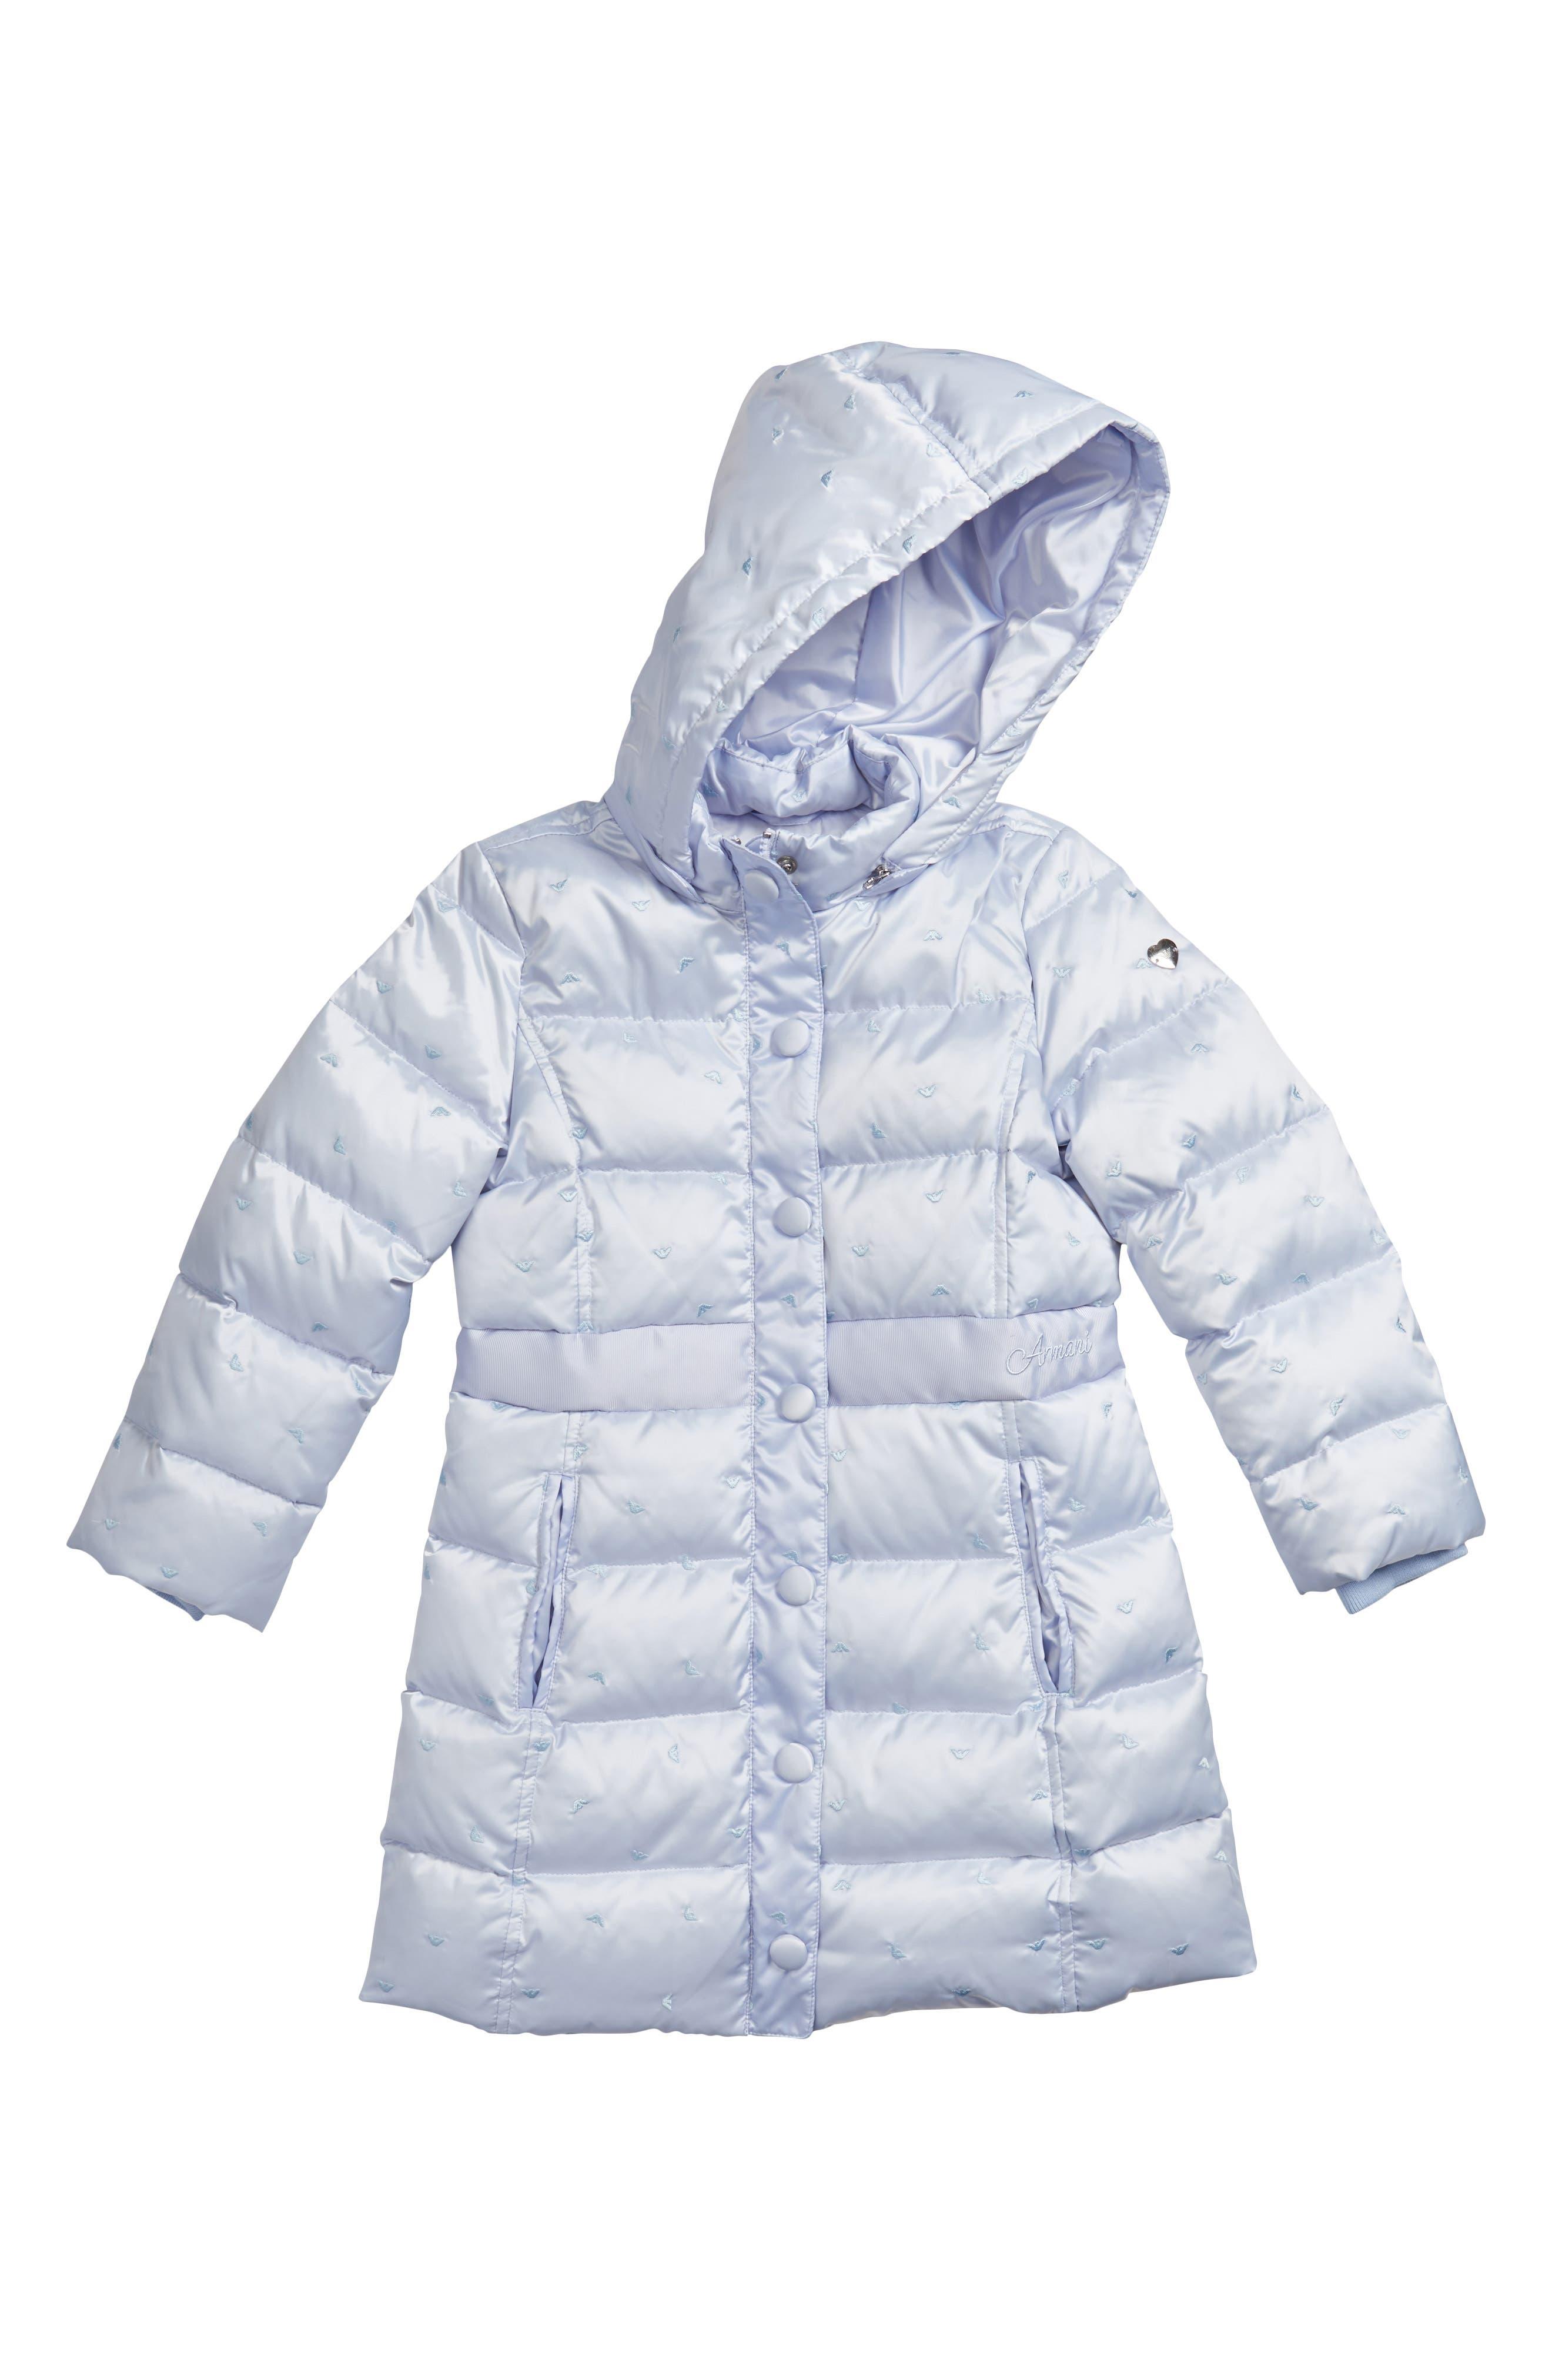 Alternate Image 1 Selected - Armani Junior Embroidered Logo Down Puffer Jacket (Little Girls & Big Girls)